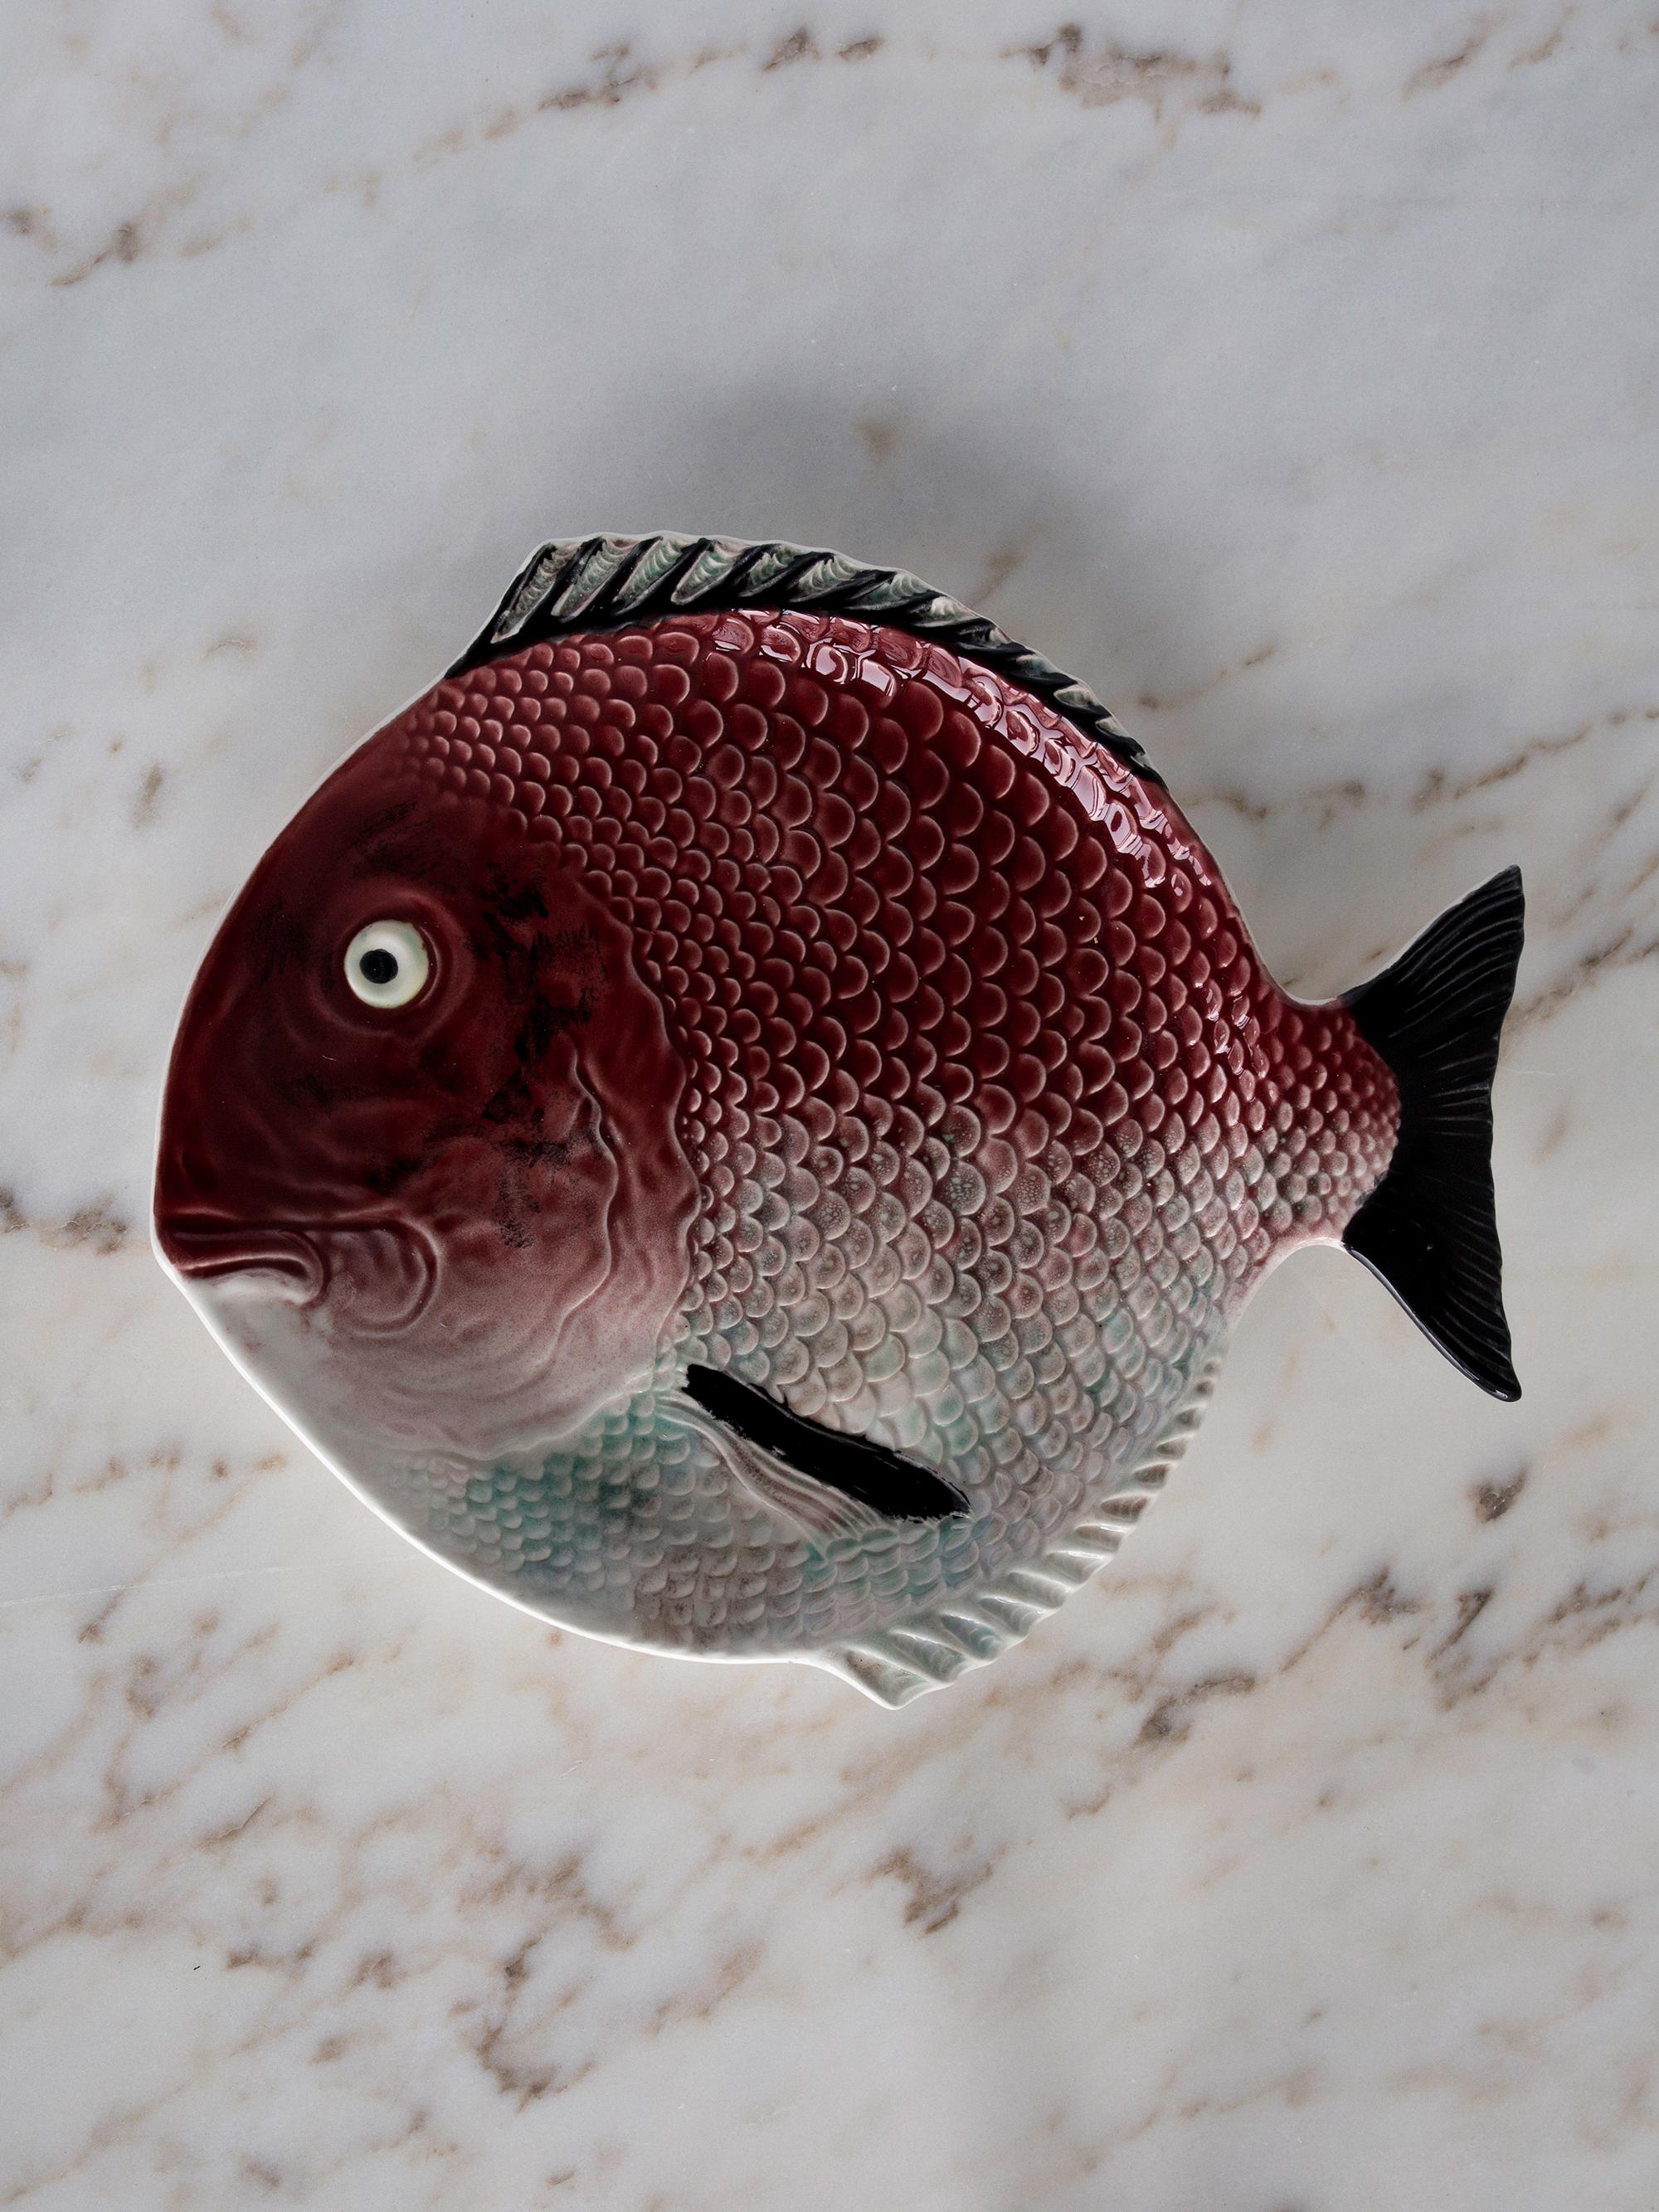 29687_c694a5ddc2-fish-plate-fat-ovan-zoom.jpg